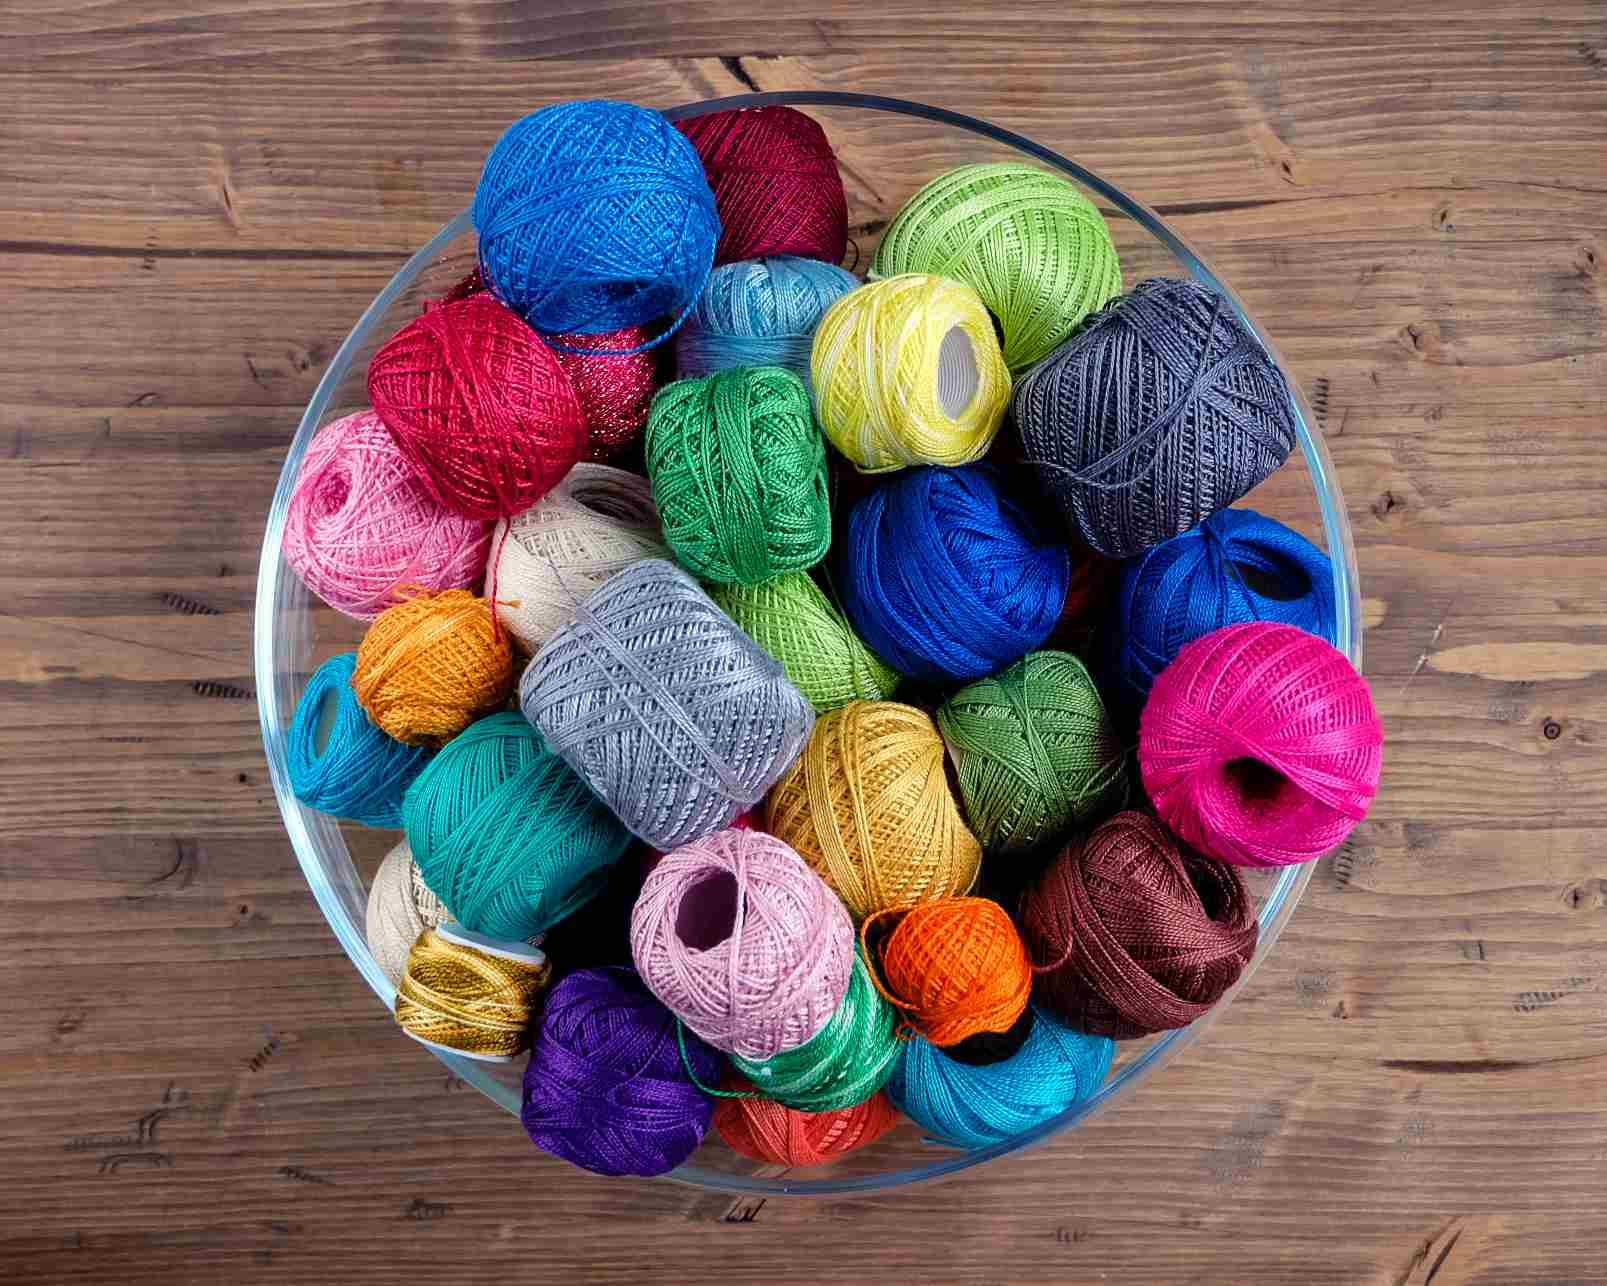 bowl of crochet thread spools